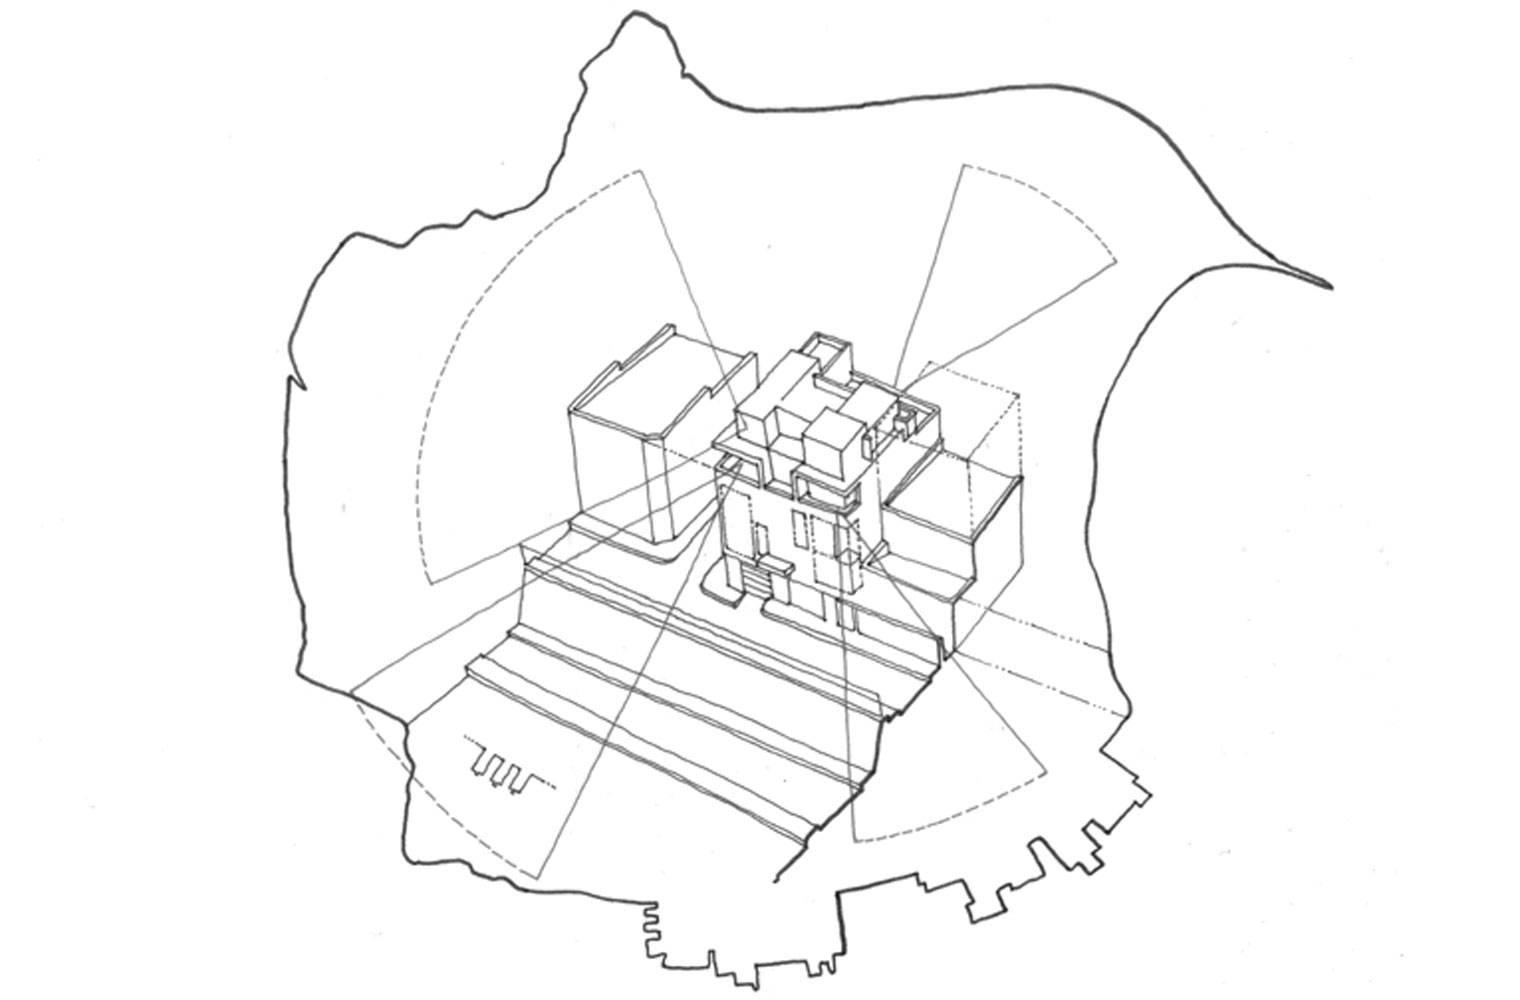 236 Buitengragt Street - Context Diagram